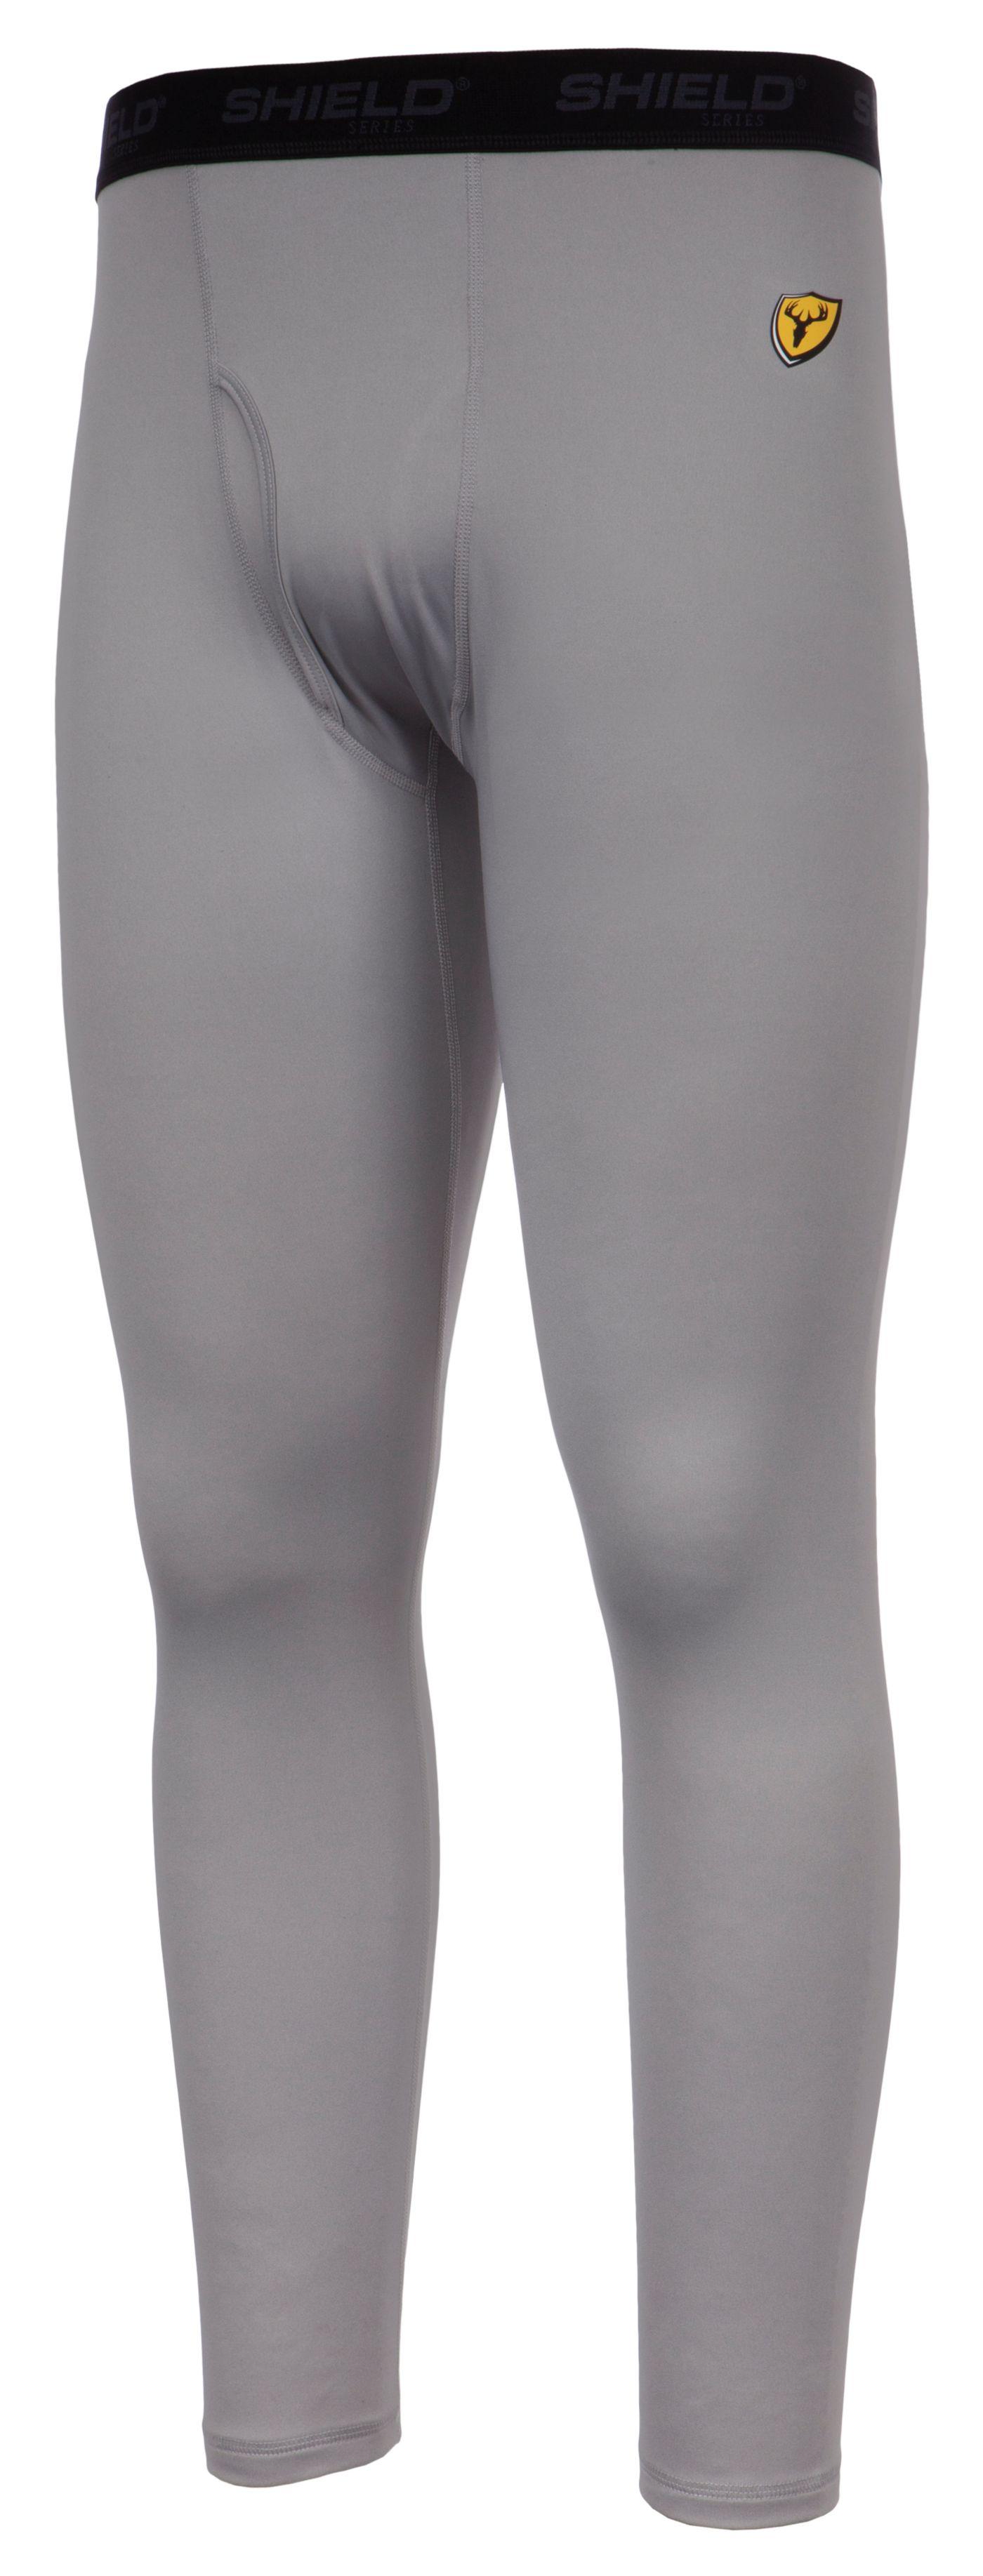 Blocker Outdoors Koretec Men's Base Technical Weight Pants